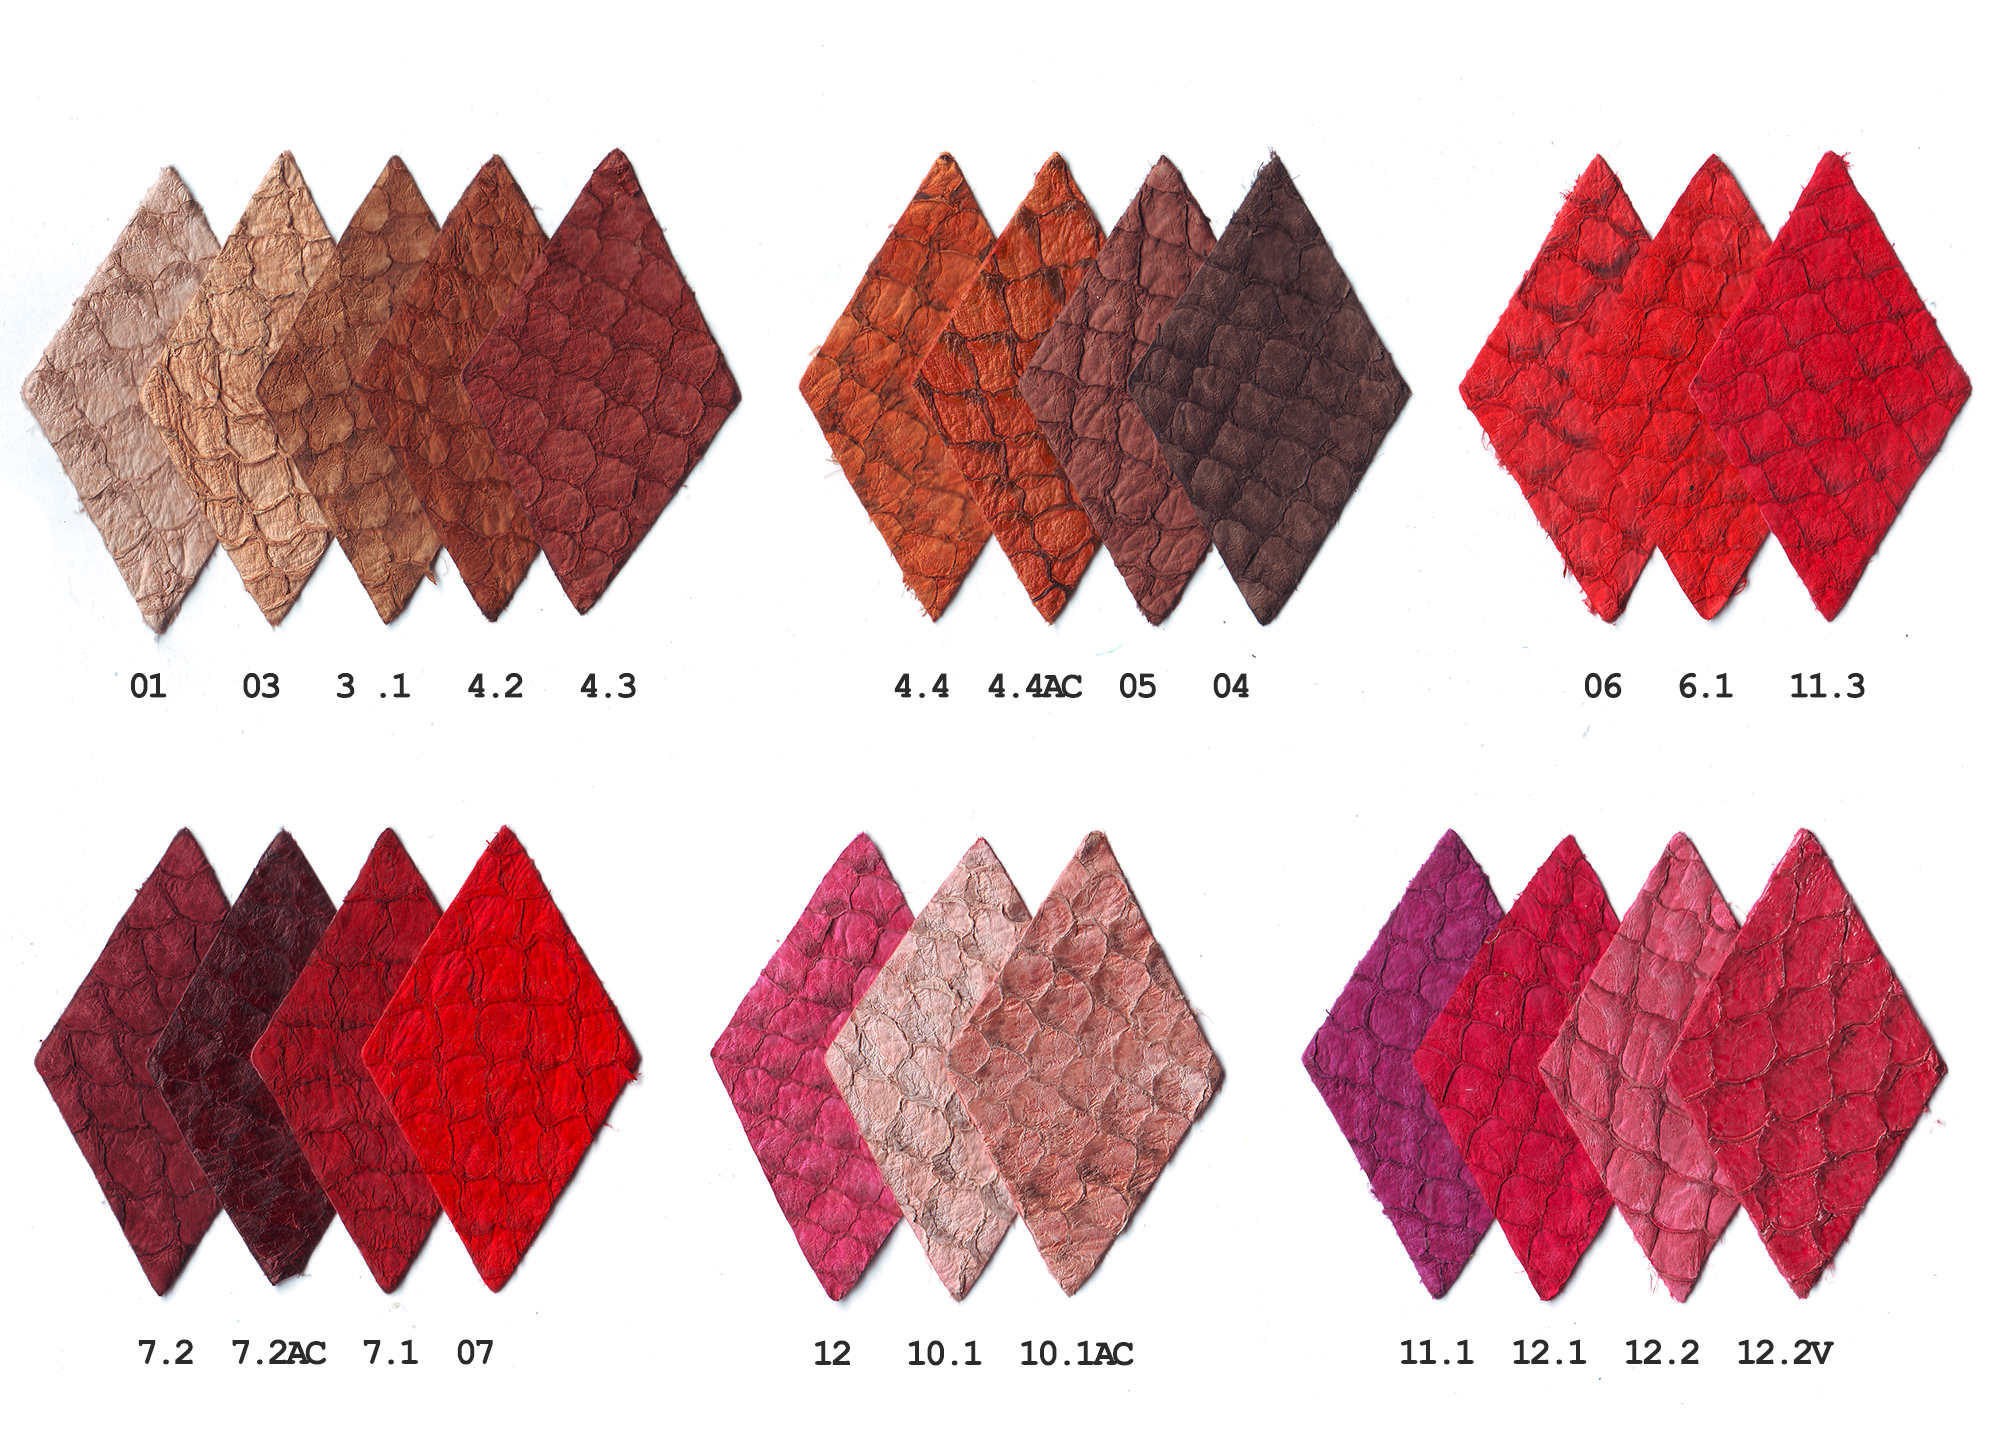 Cartela de cores I_2015.jpg